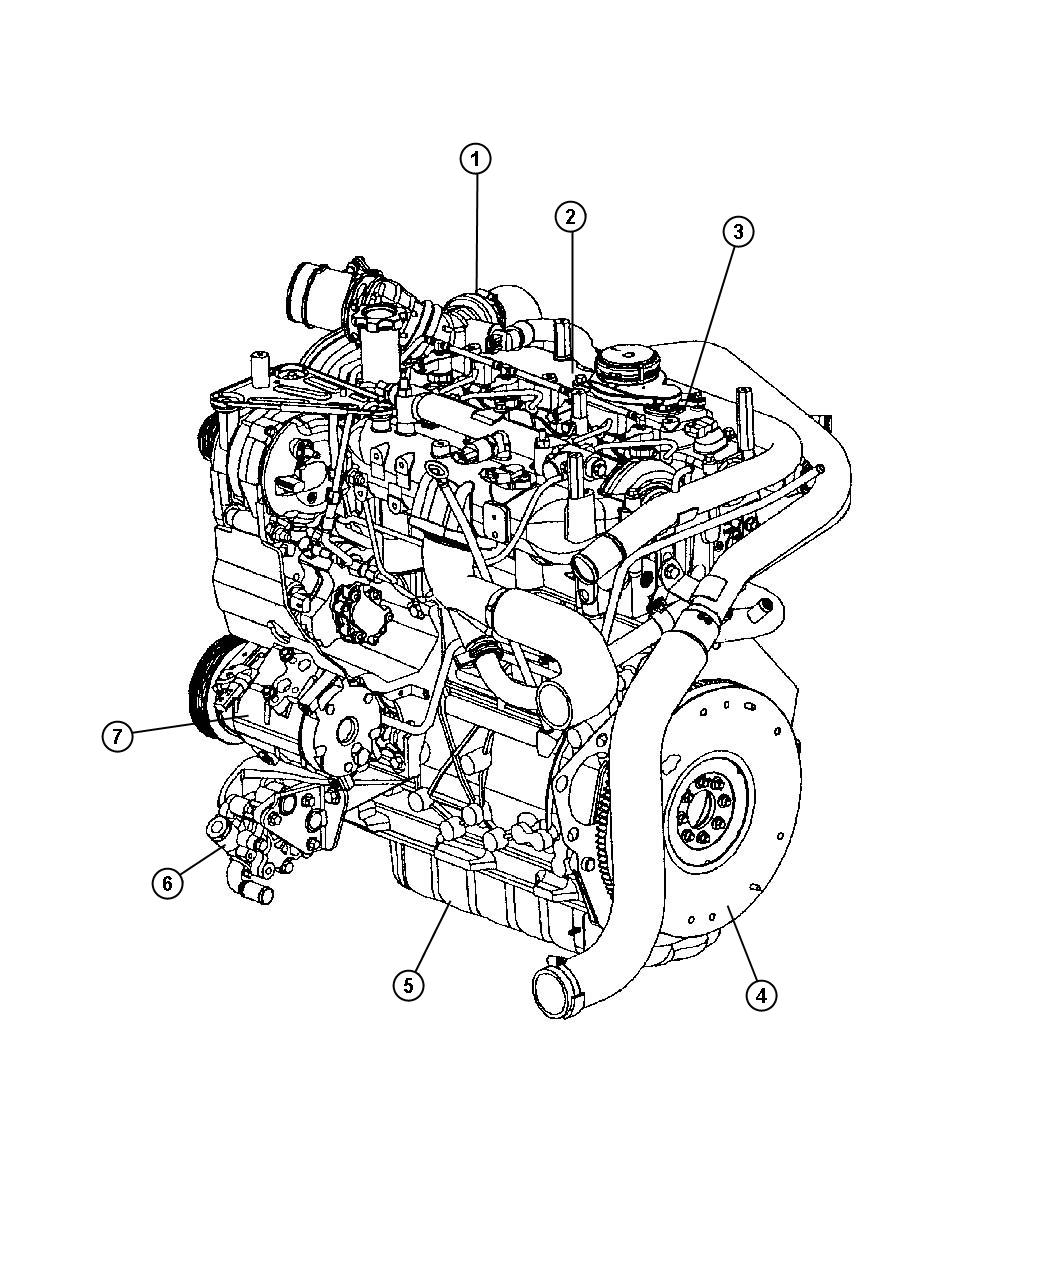 Chrysler Pt Cruiser Flywheel Turbosel Engine